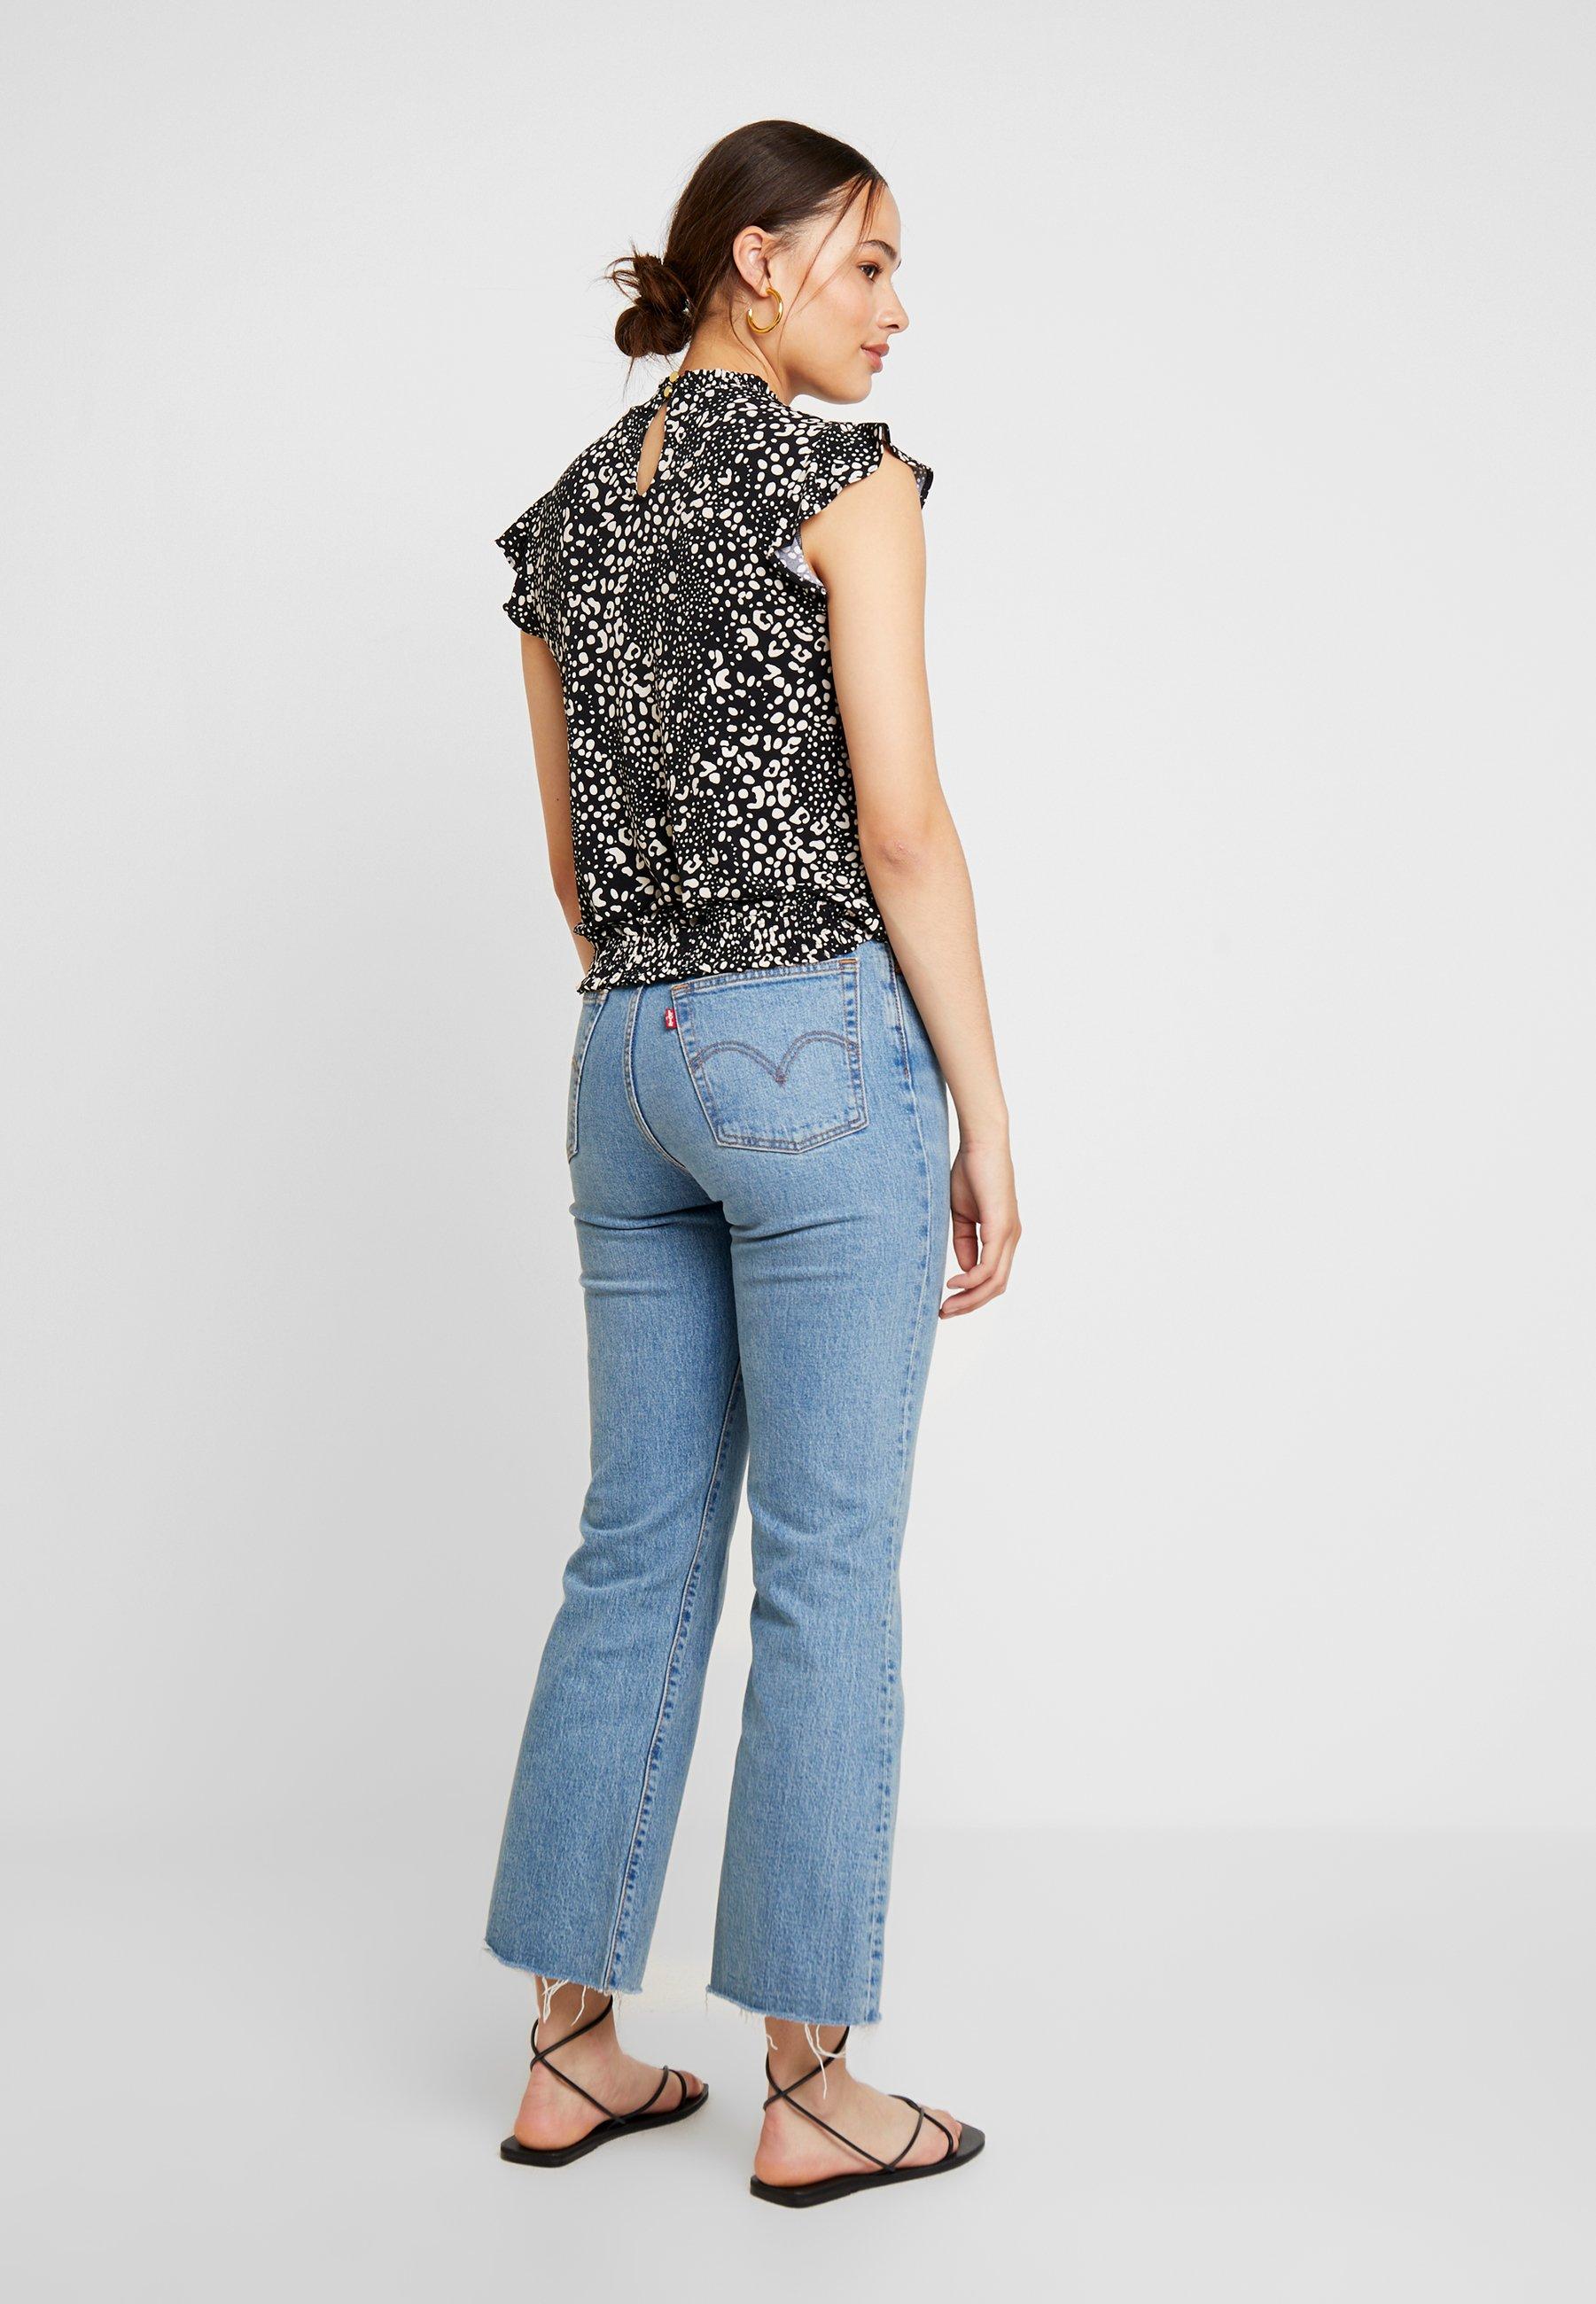 Animal Patched ShellT Oasis Sheered Neck Imprimé shirt Black mN80nwv